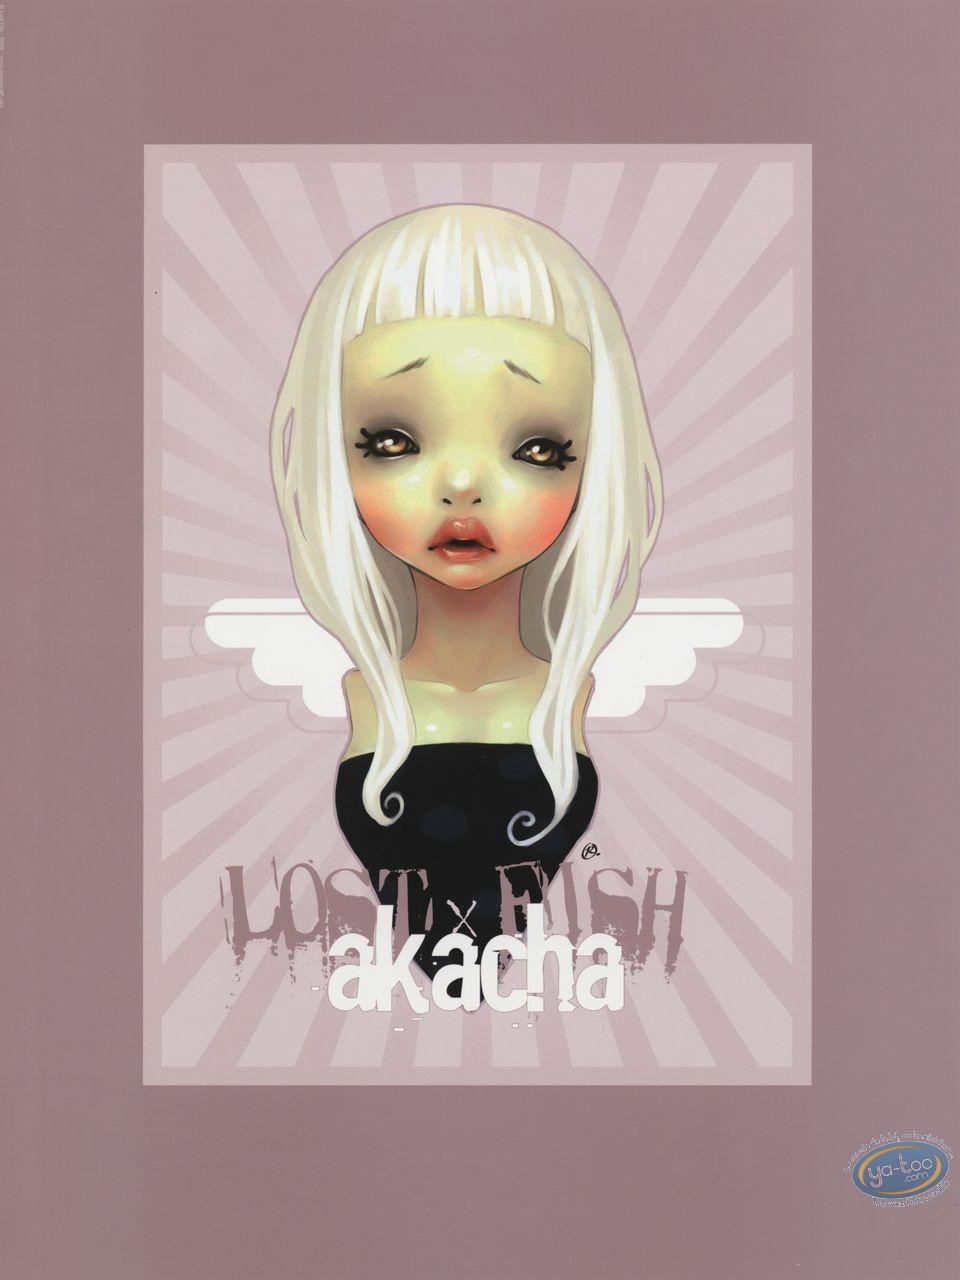 Offset Print, Lostfish : Akacha